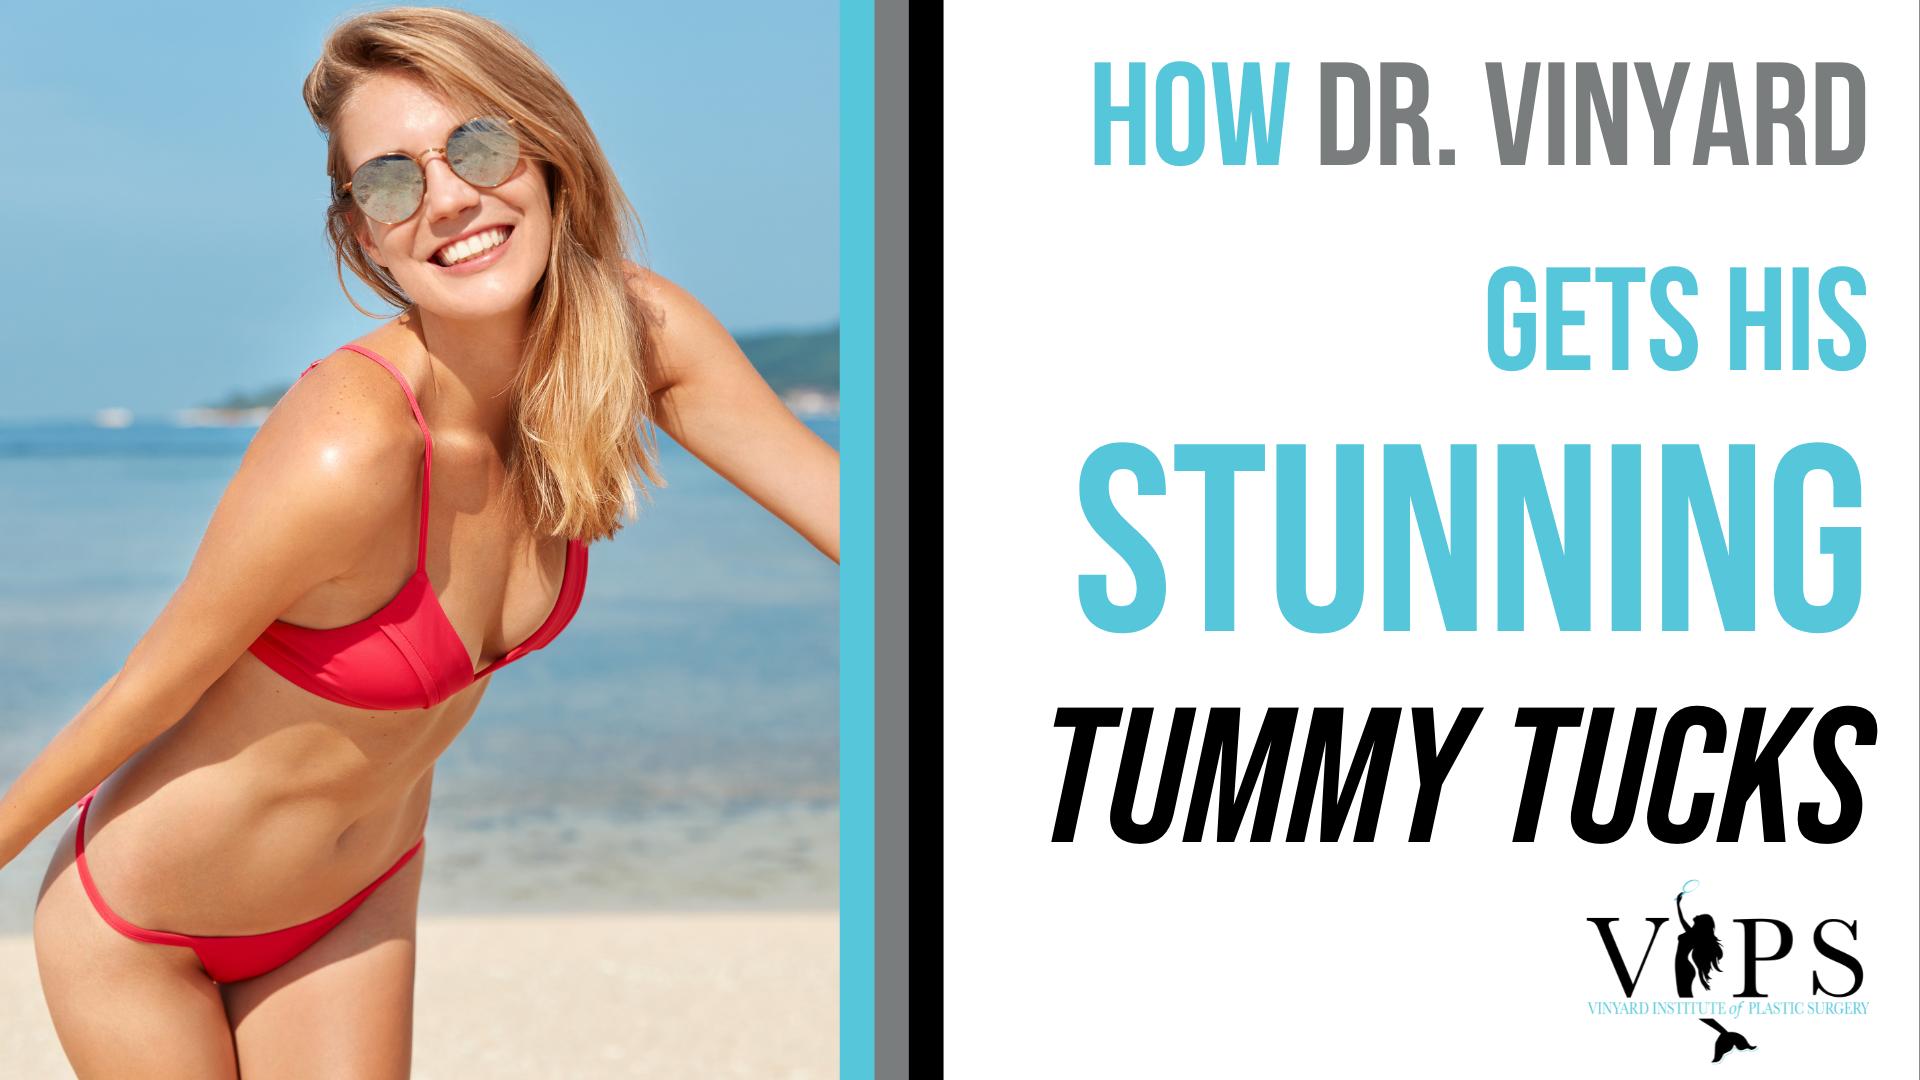 How Dr. Vinyard Gets His Stunning Tummy Tucks